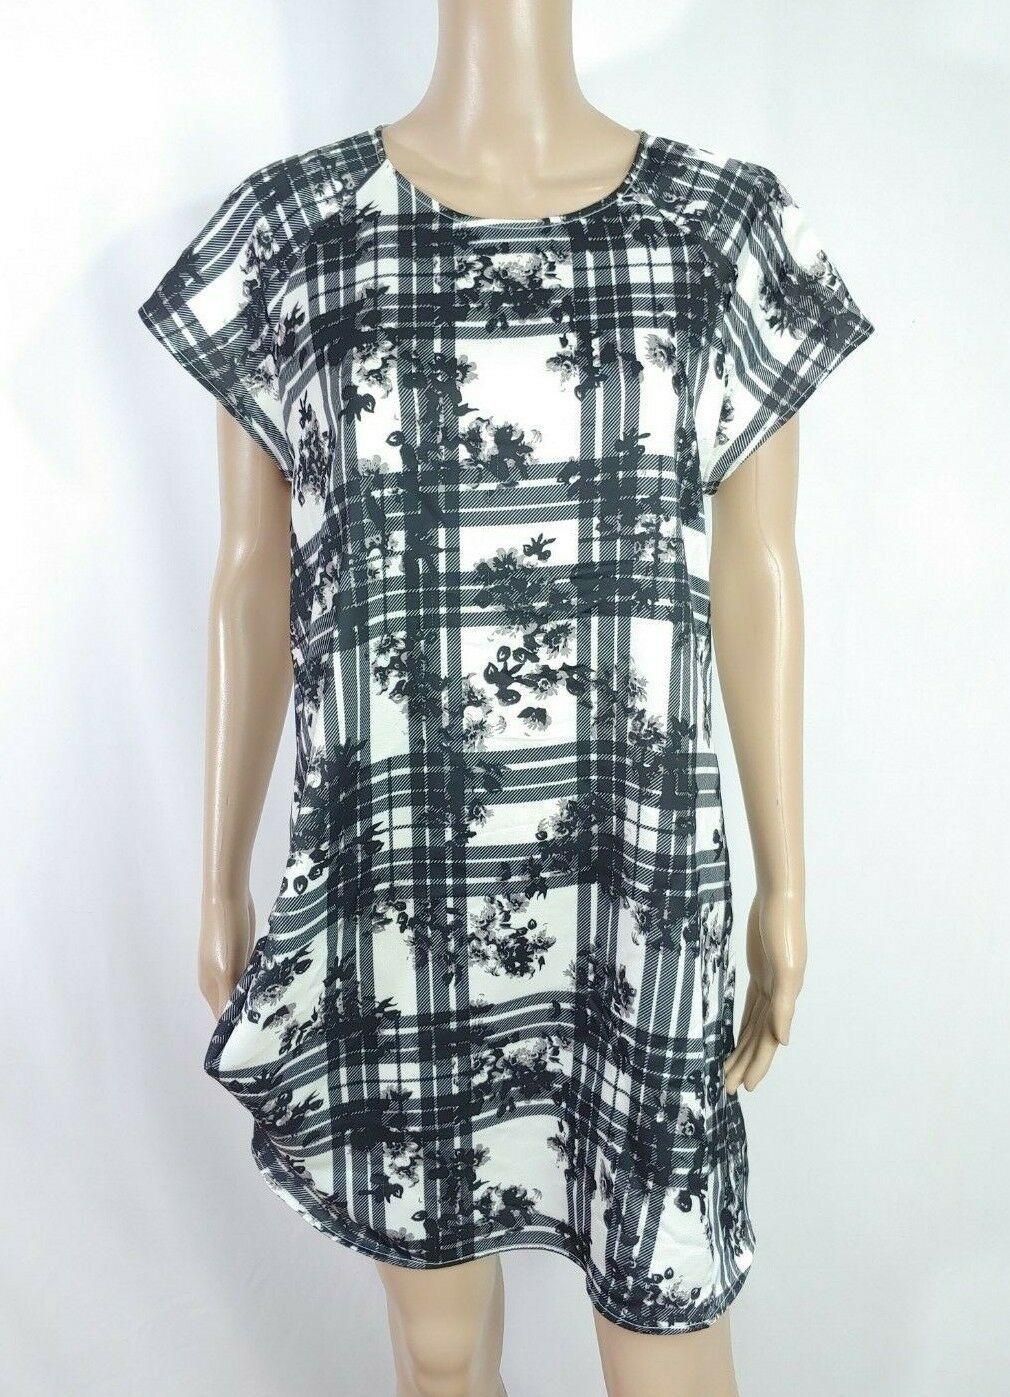 Finders Keepers Surrender Black White Floral Plaid Draped Shift Shirt Dress M